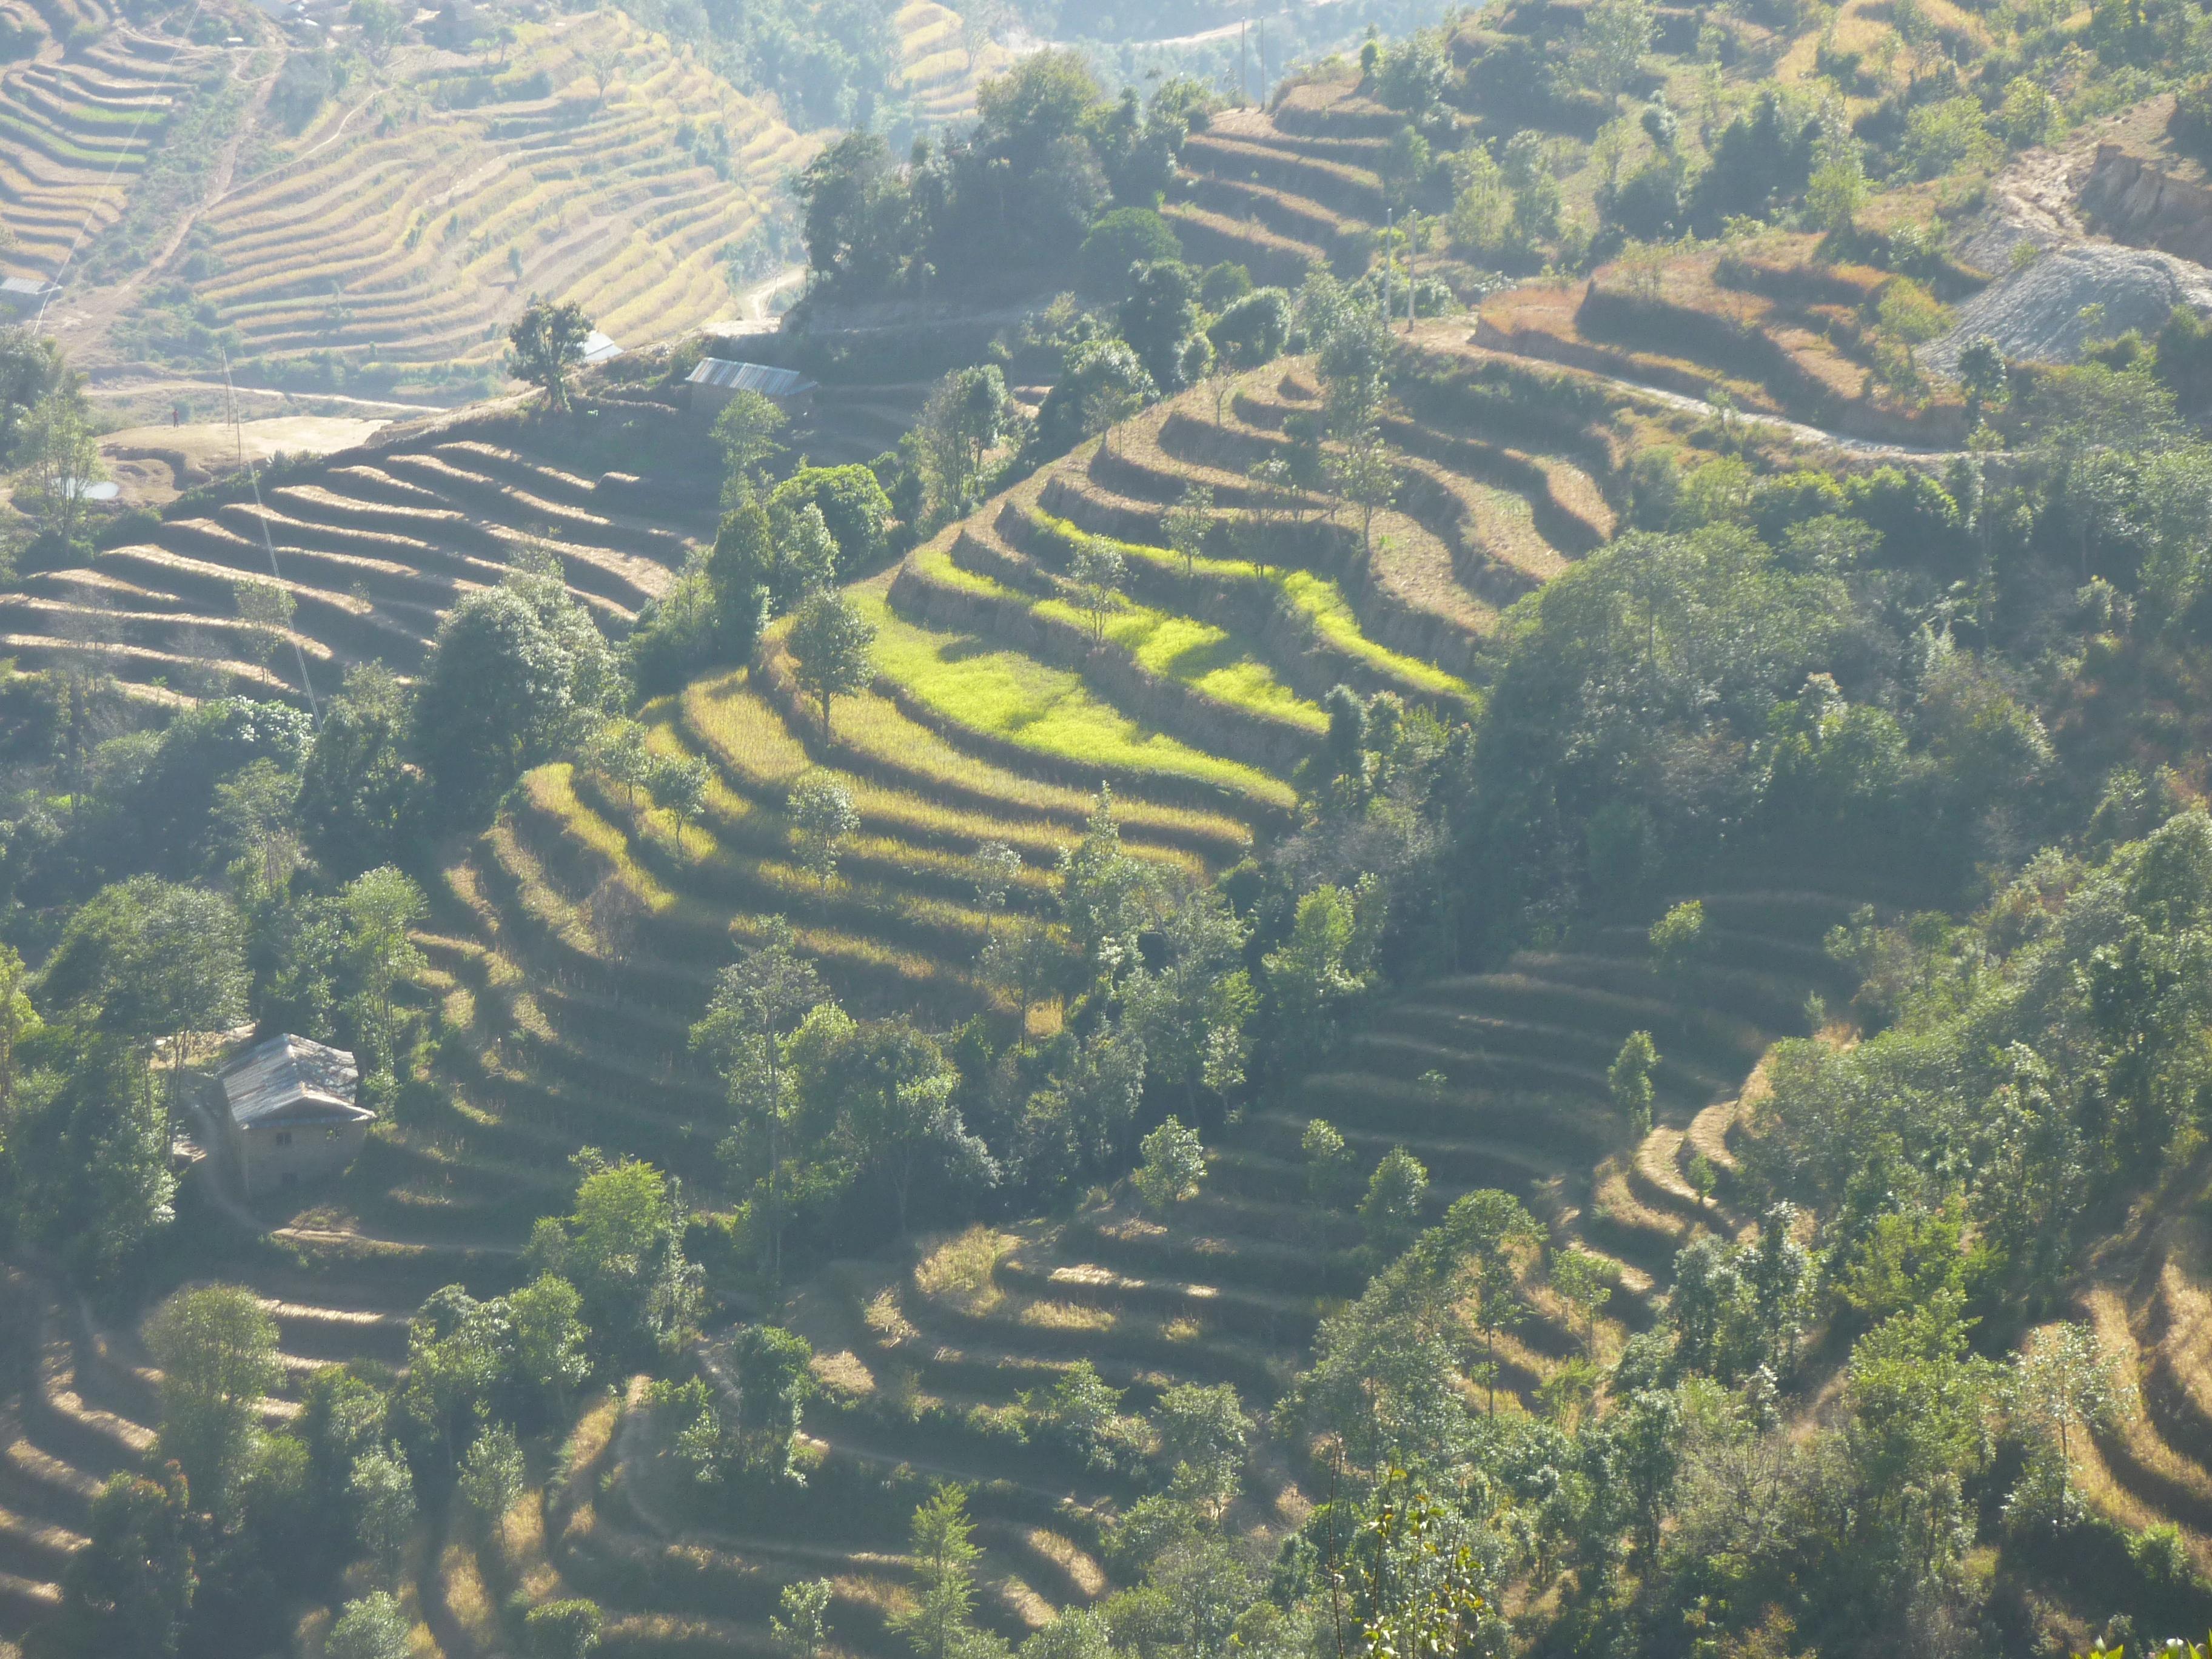 Helambu Terraces